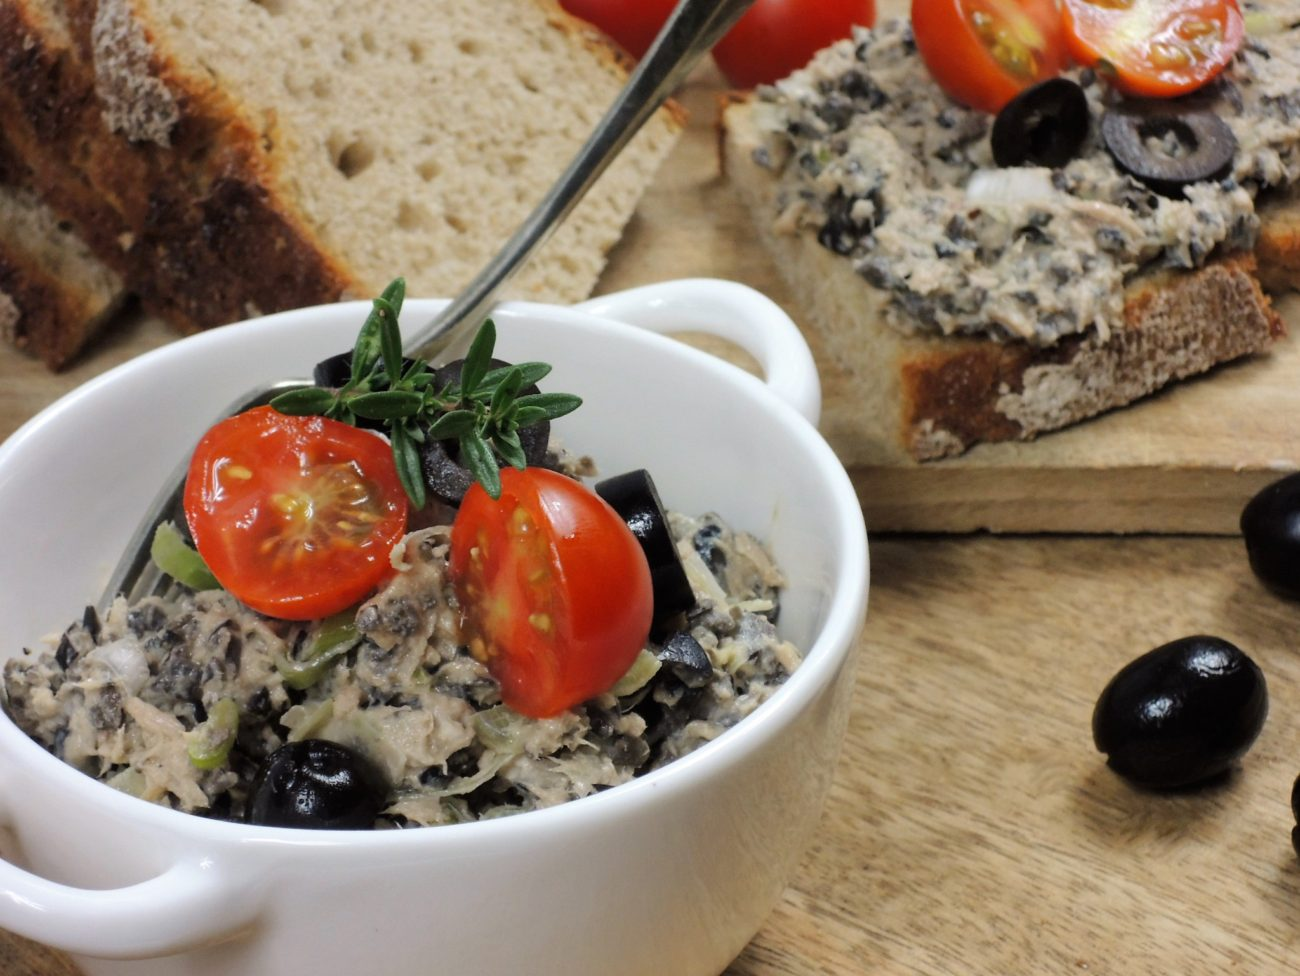 Pomazánka z tuňáka a černých oliv